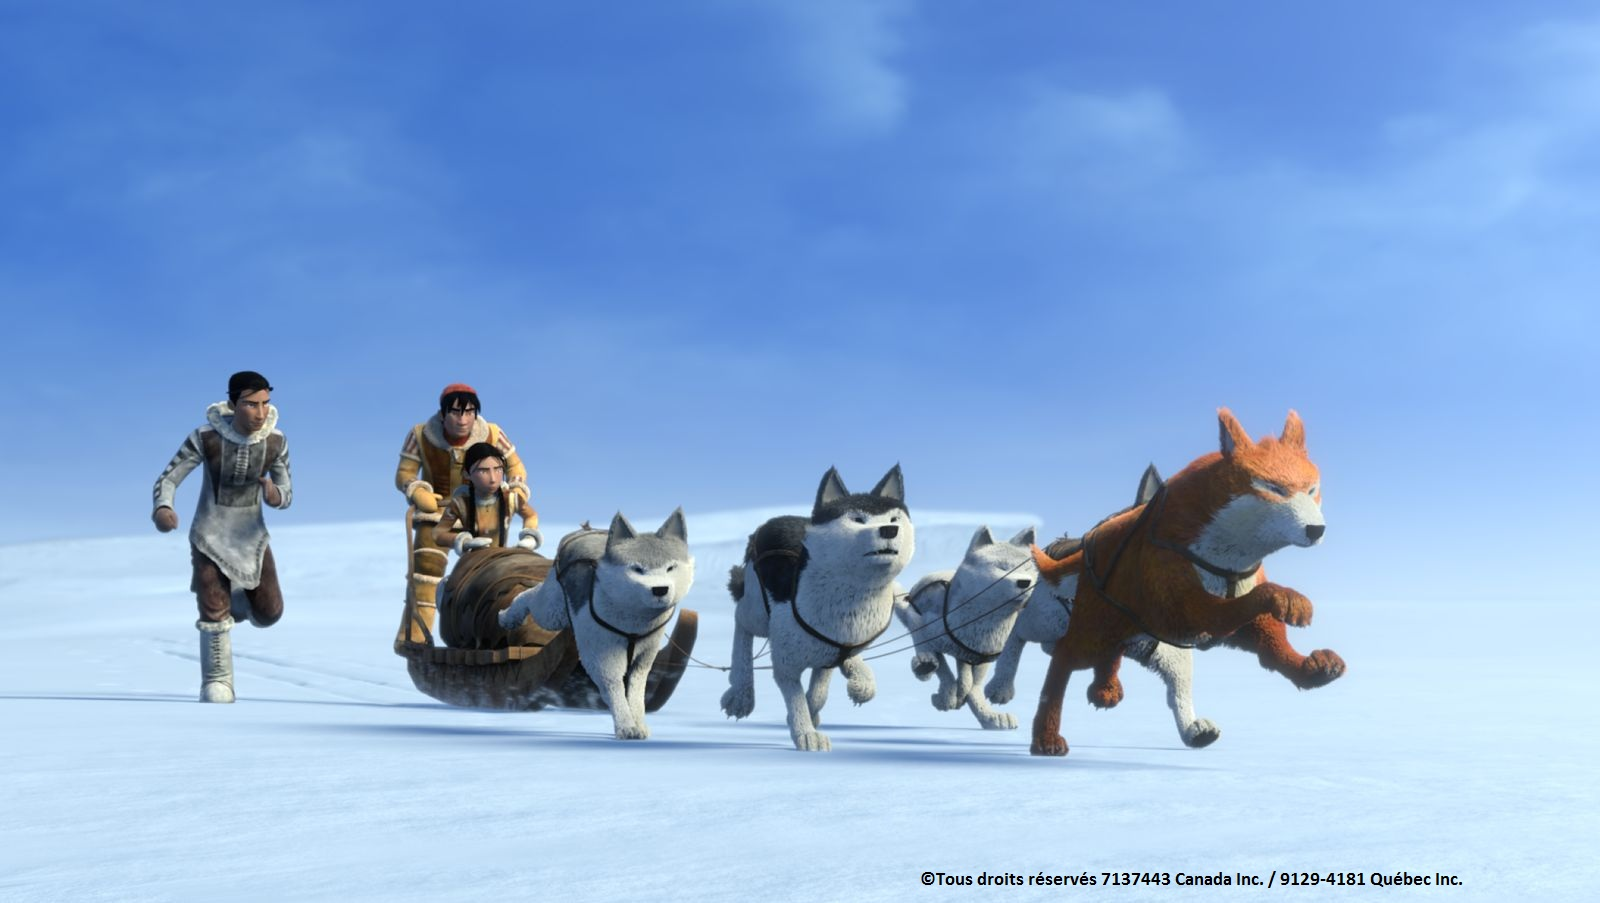 Legende Sarila Trio on sled 10AVe @2012 1